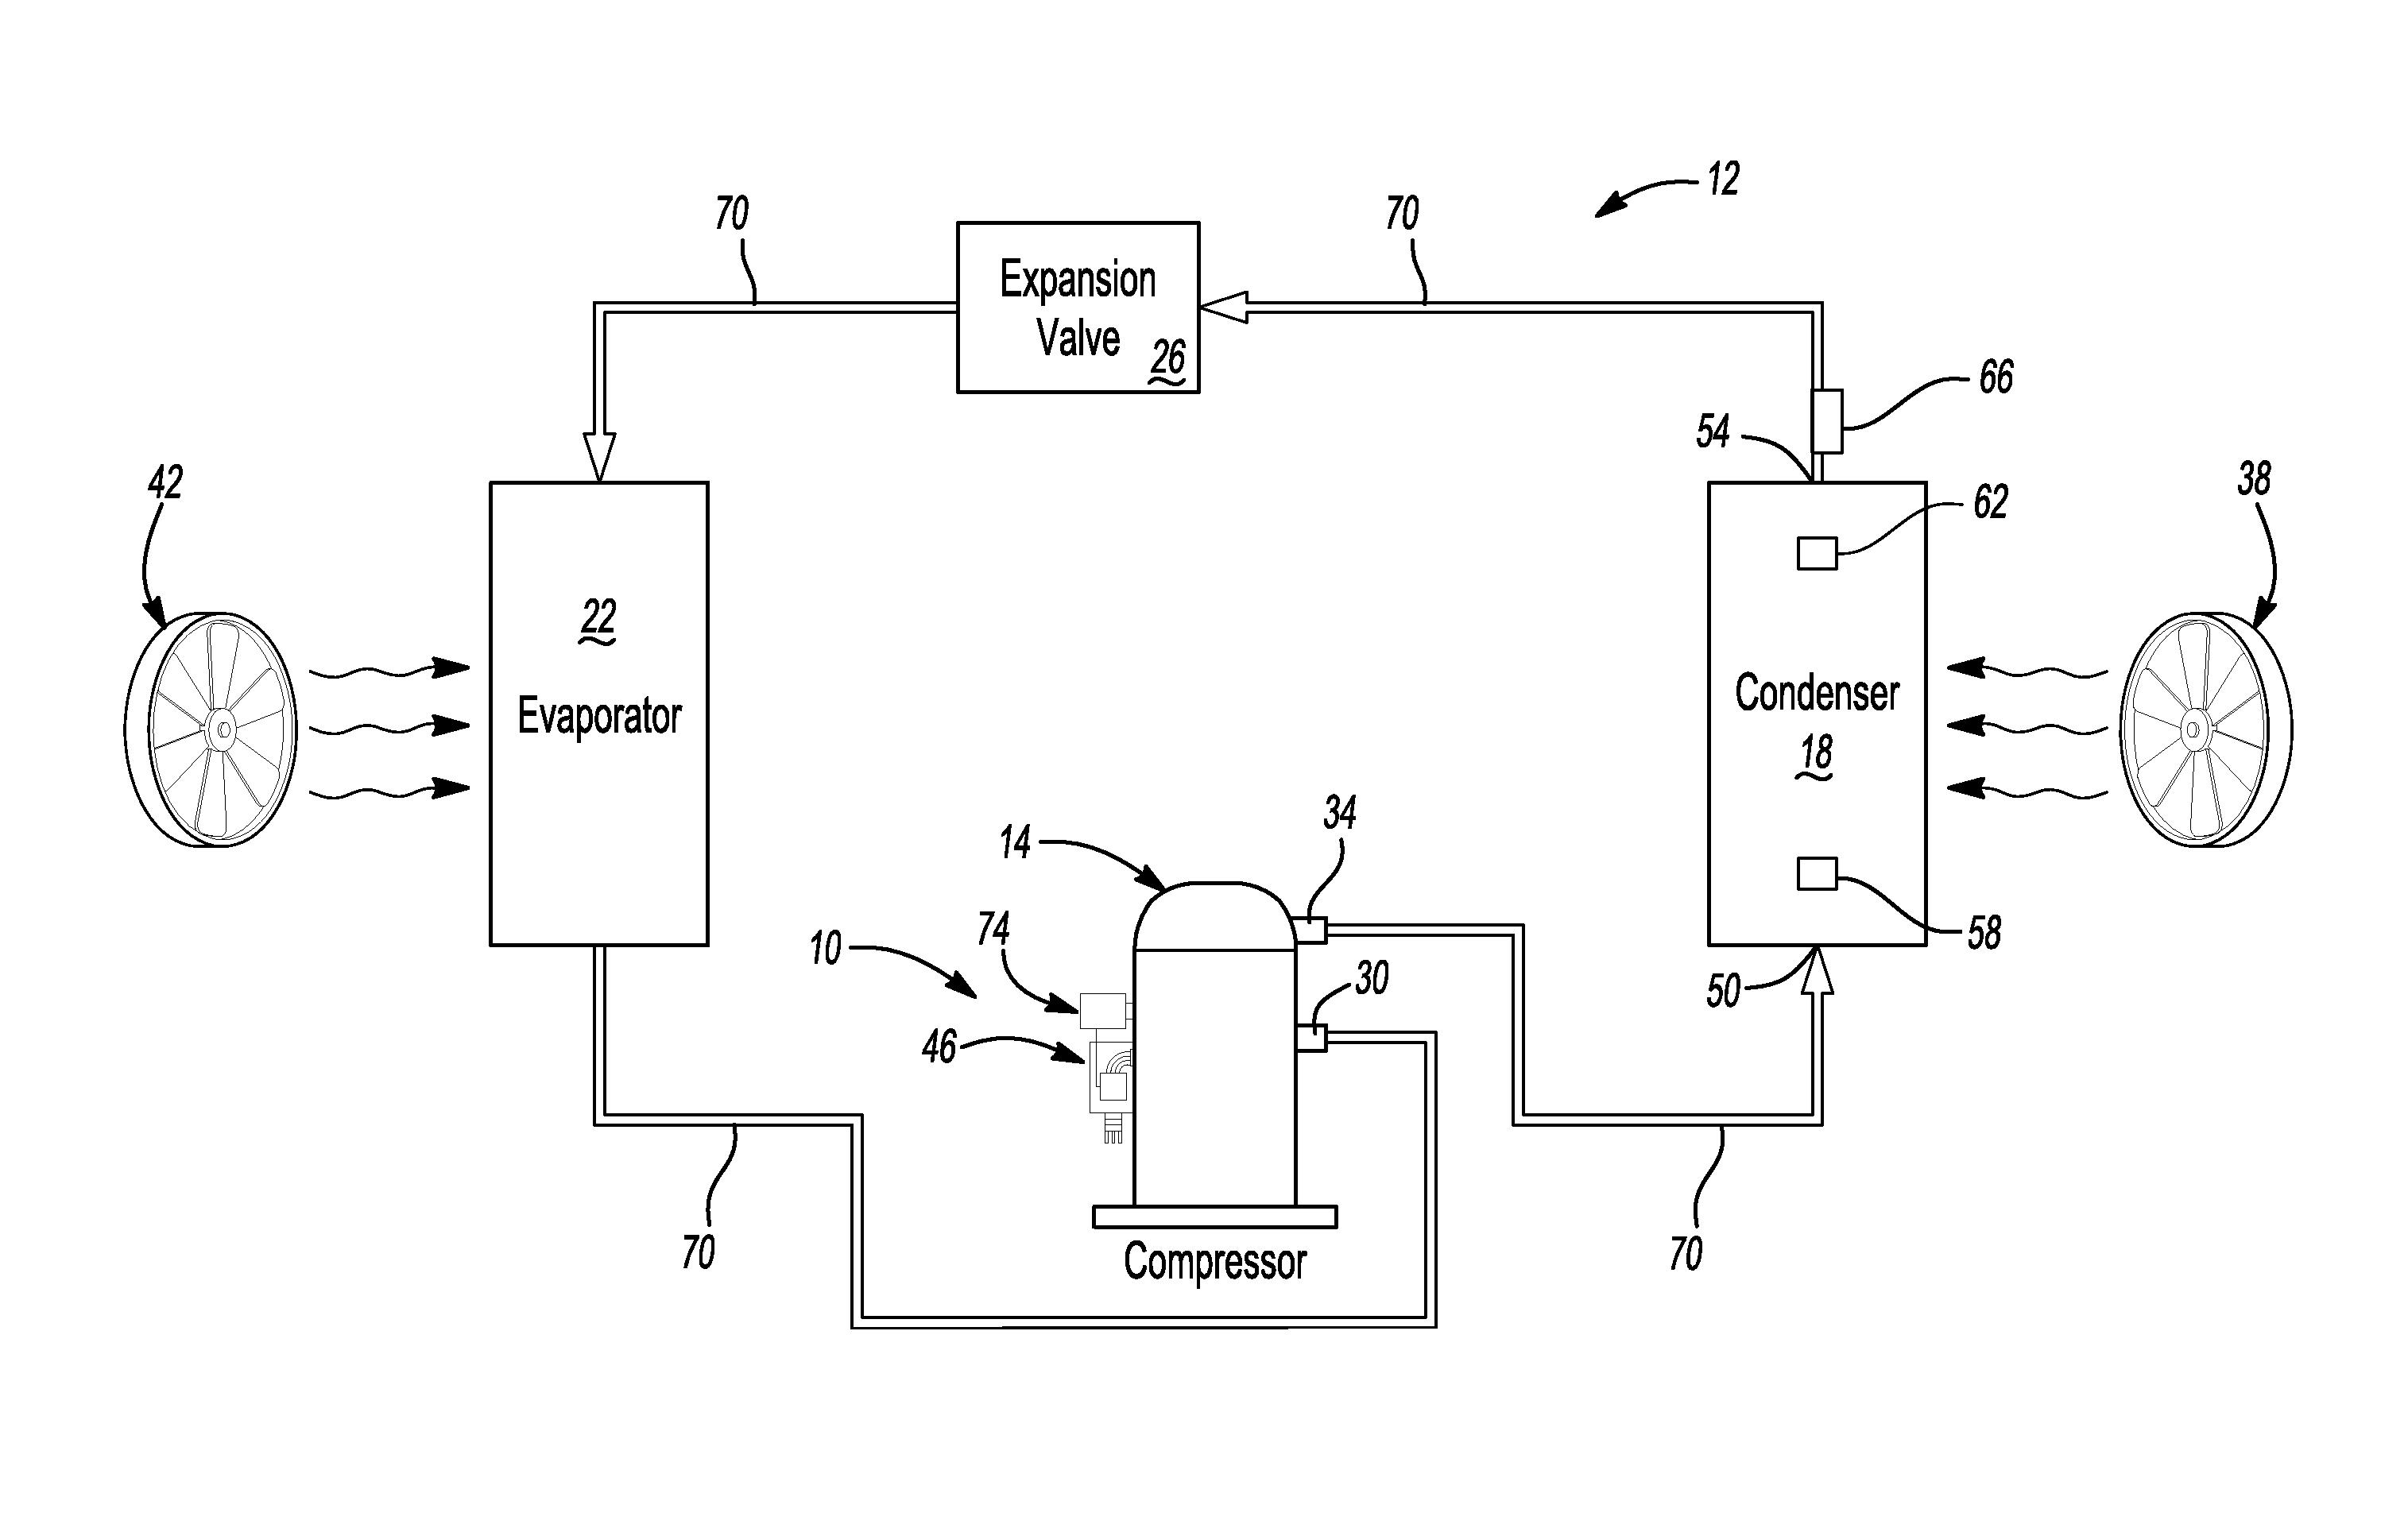 Patent US 9,803,902 B2 on